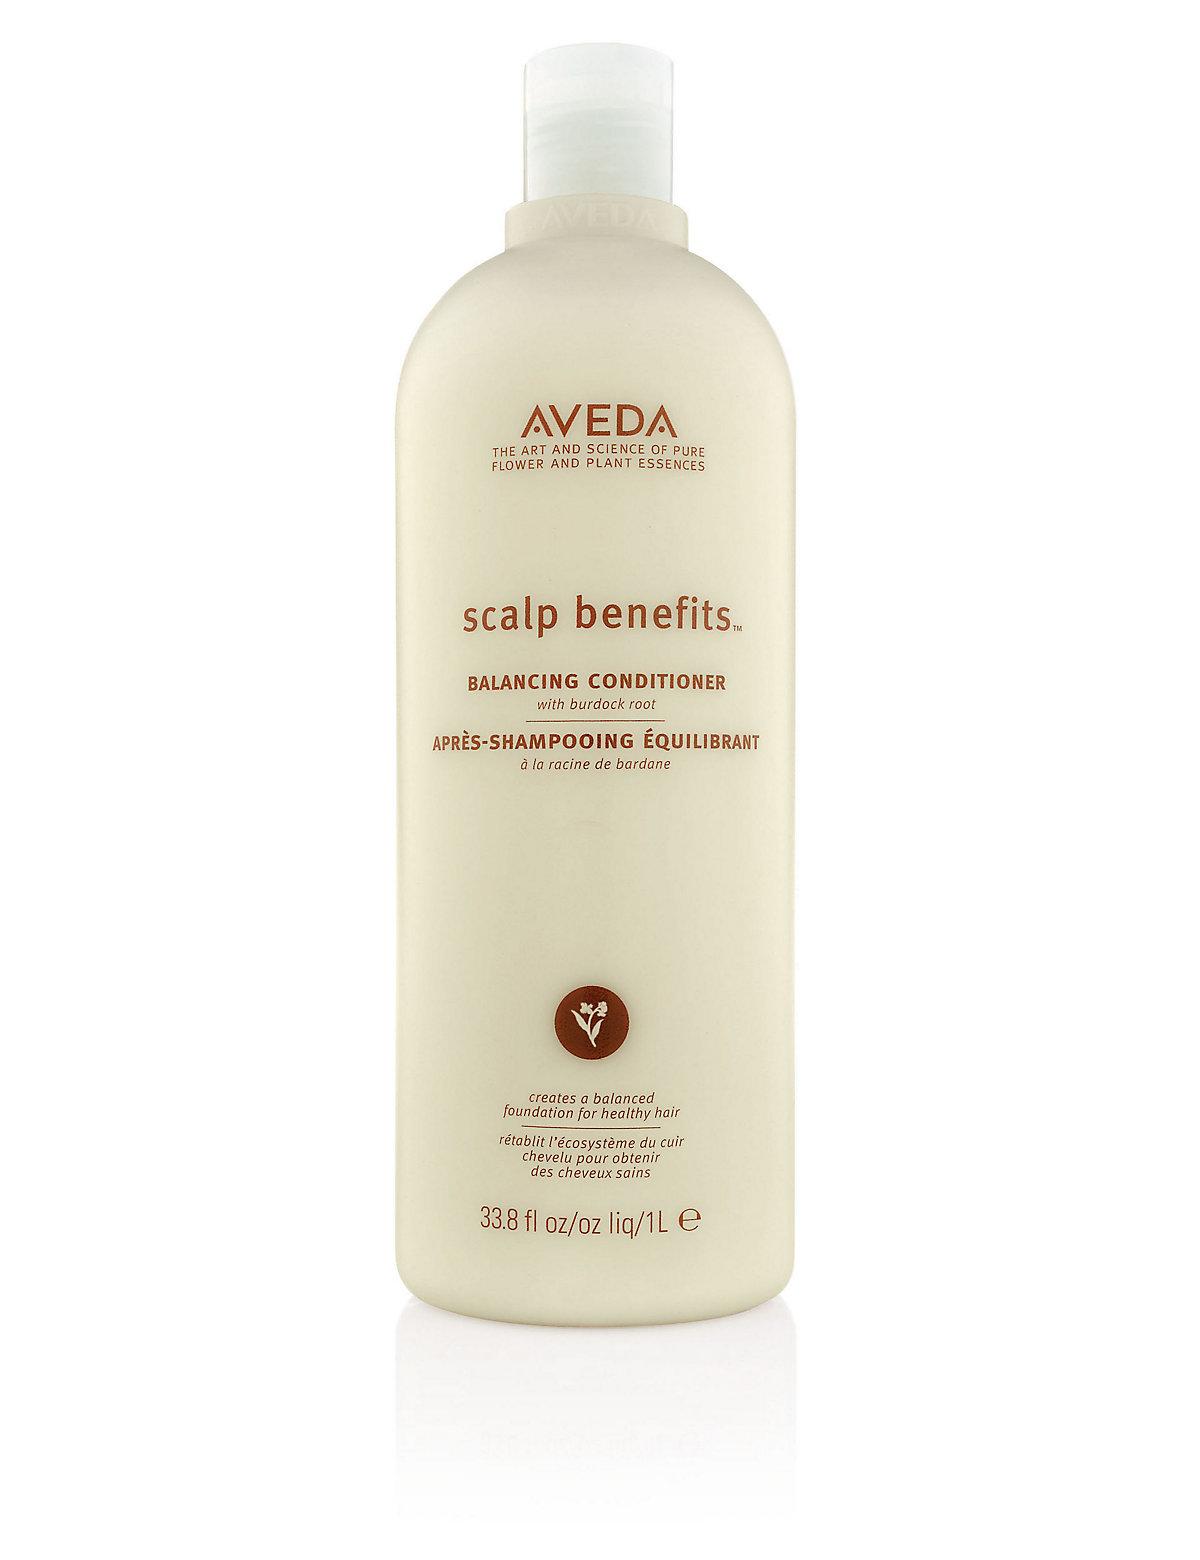 AVEDA 1 Litre Scalp Benefits Conditioner - *Save 25% per ml